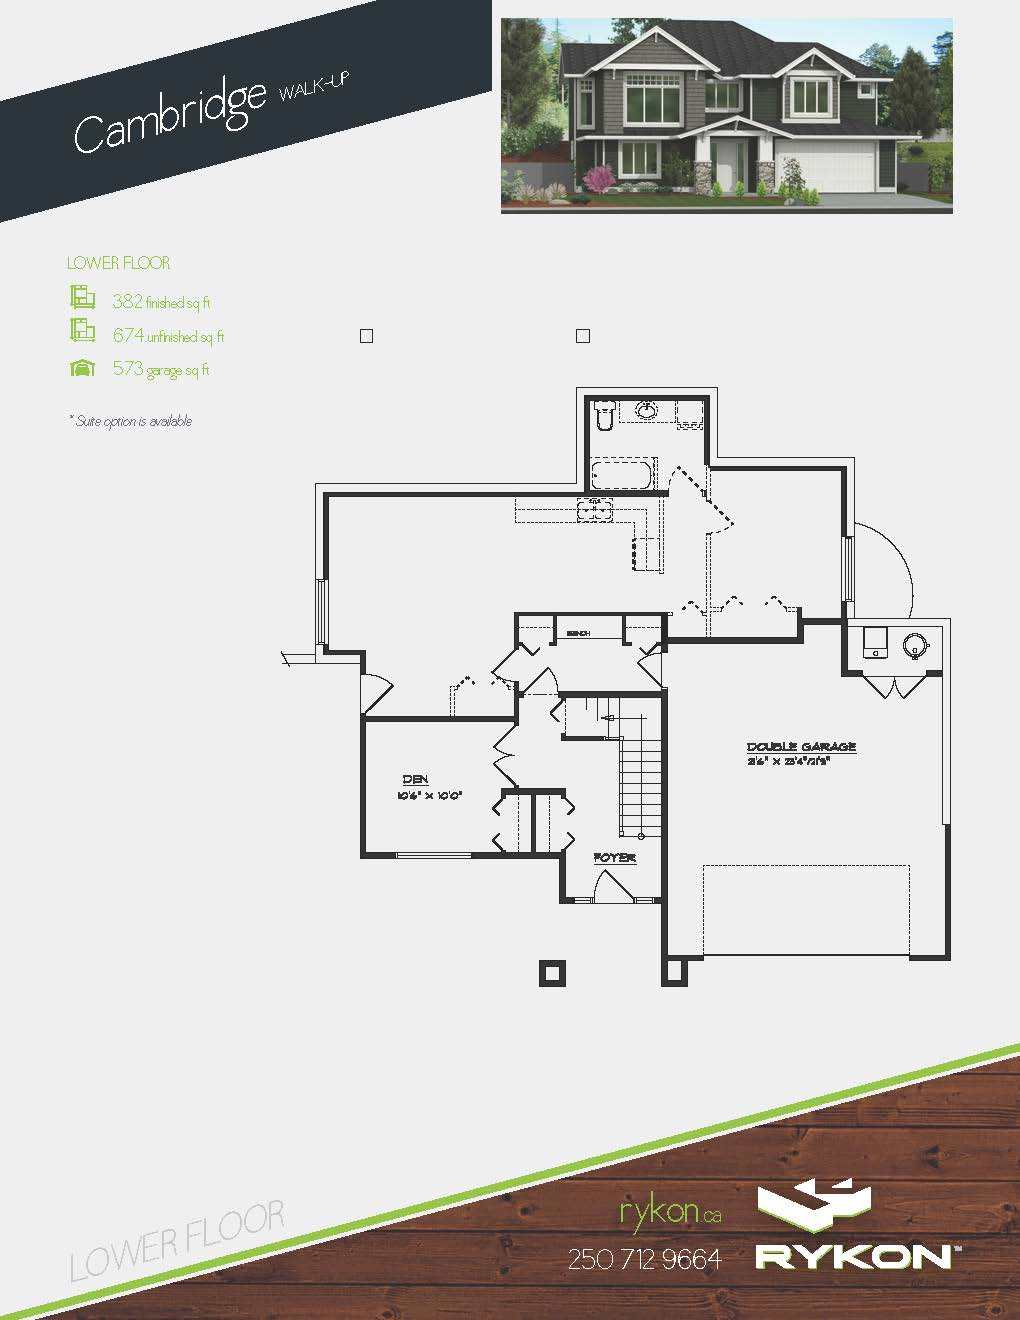 MRH - Cambridge Page 2 Floorplan